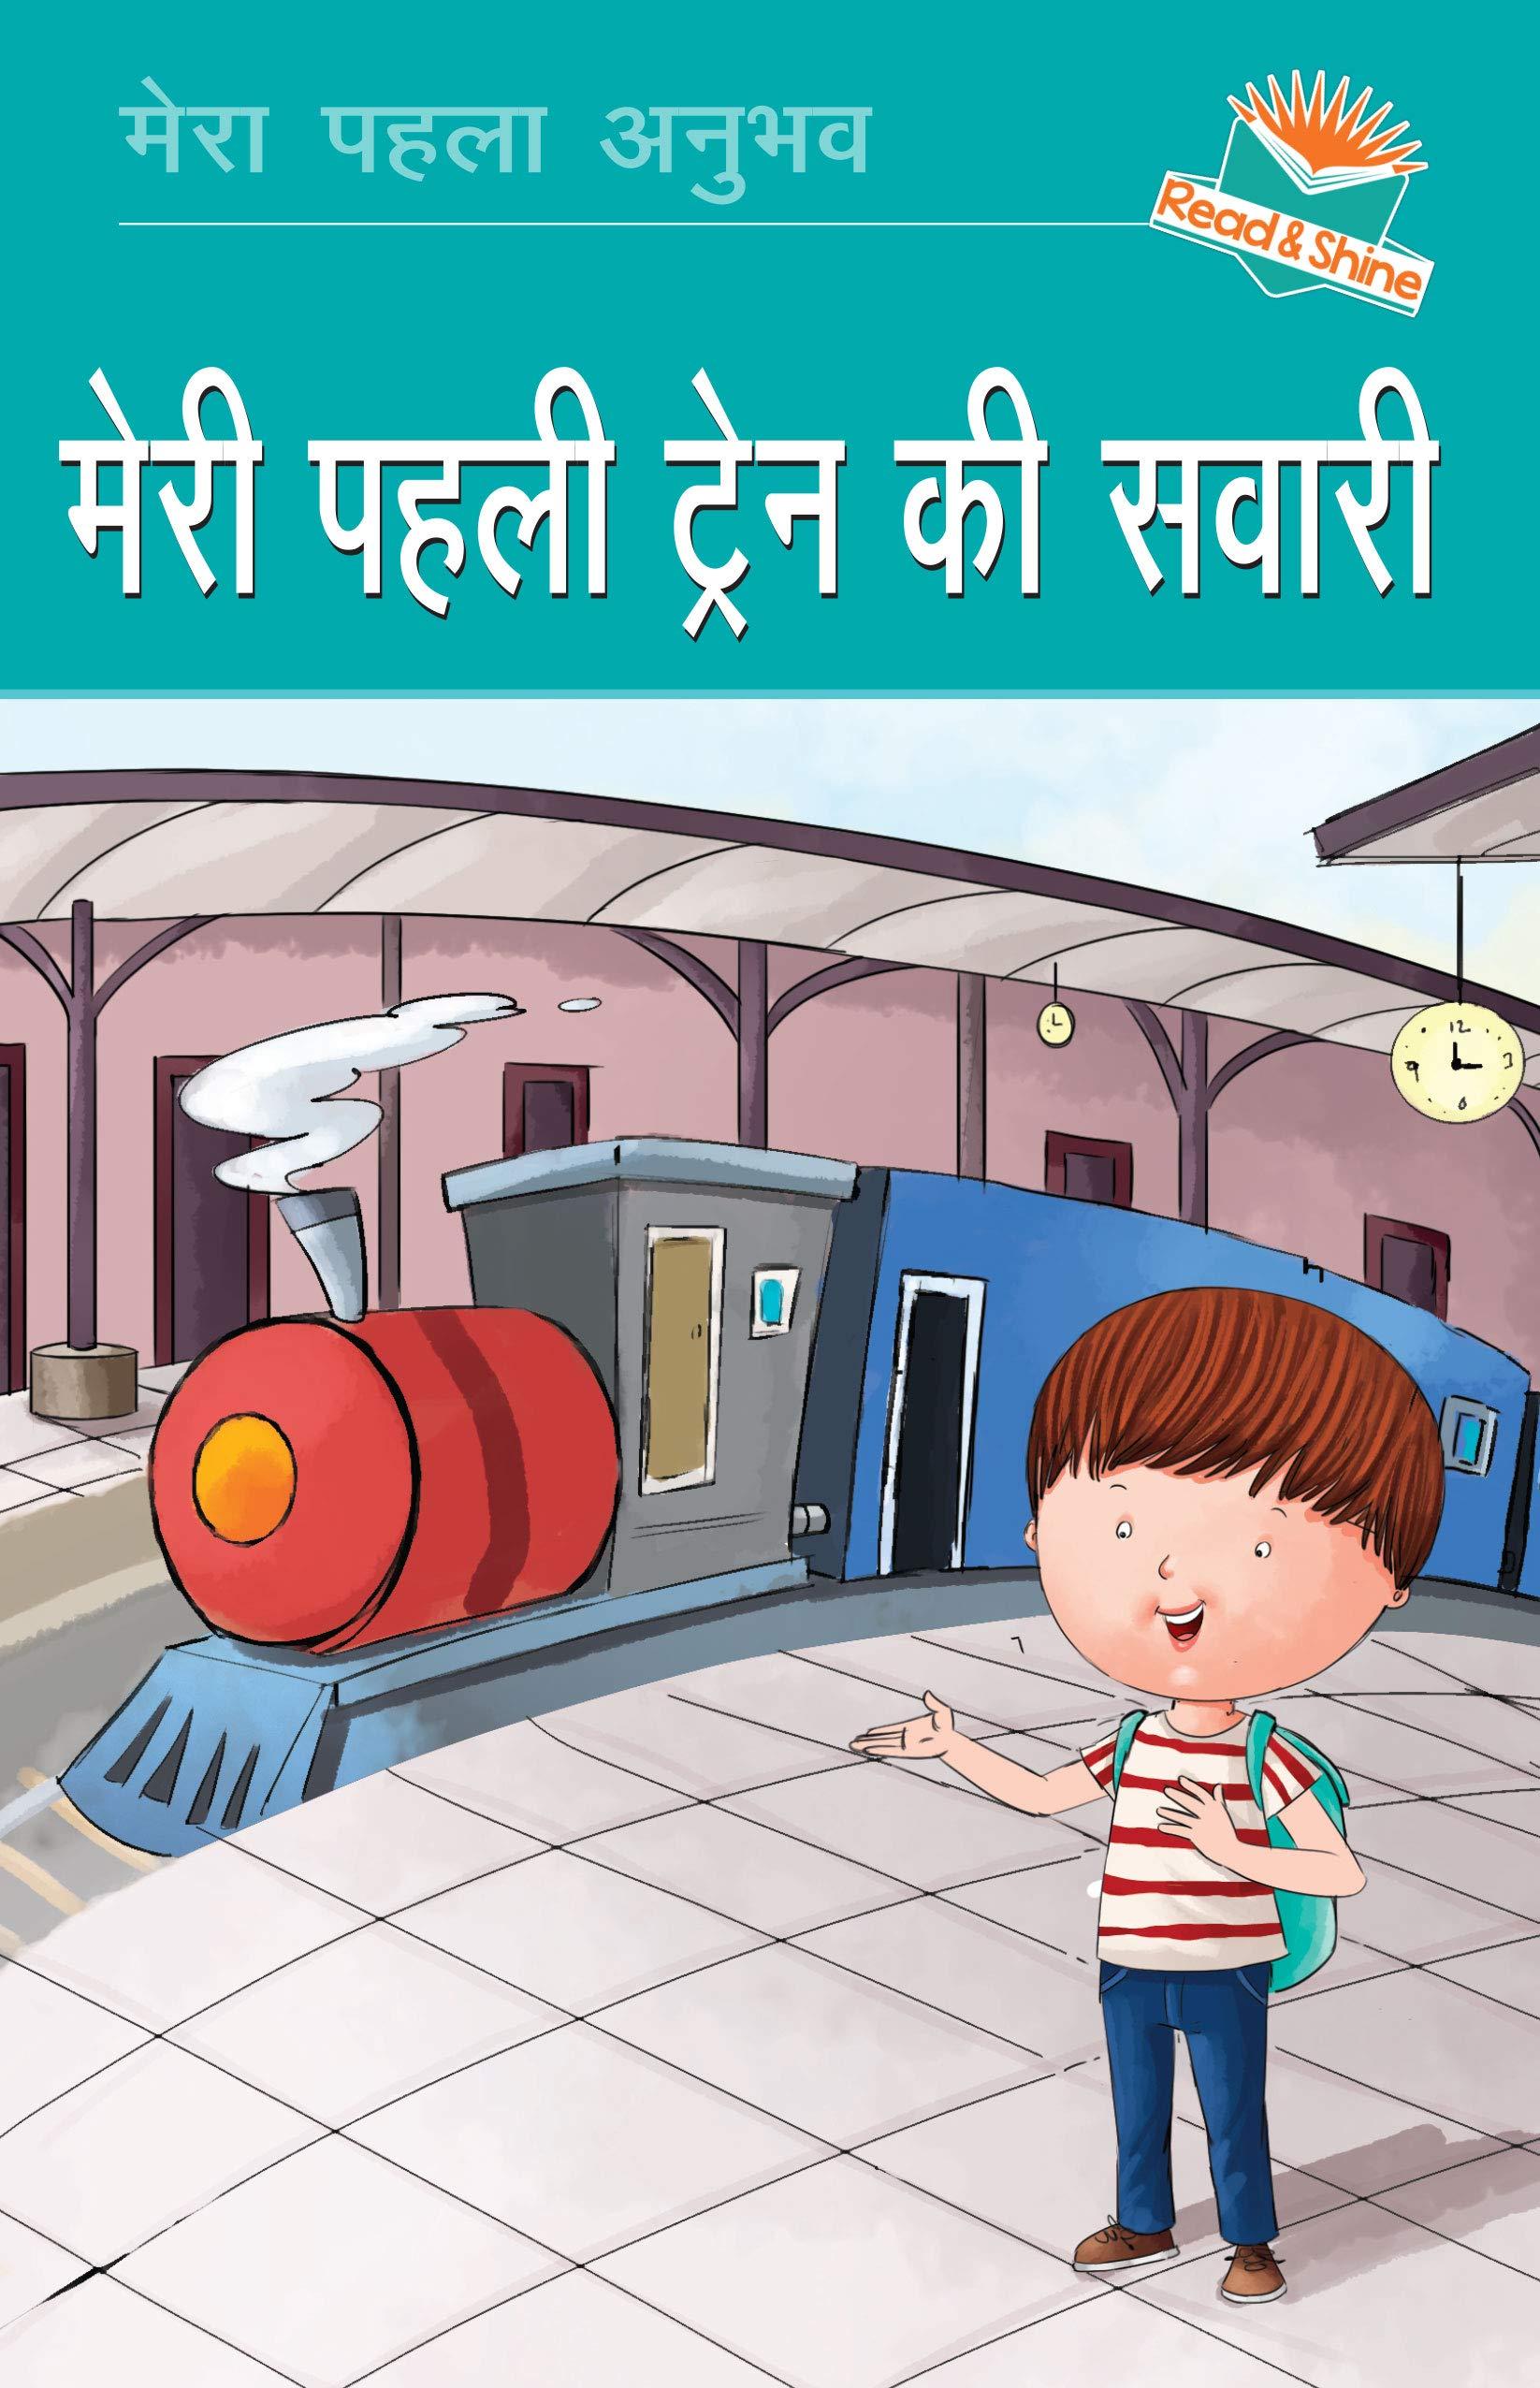 Meri Pehli Train ki Savari (My First Train Ride) – Hindi Reading Book